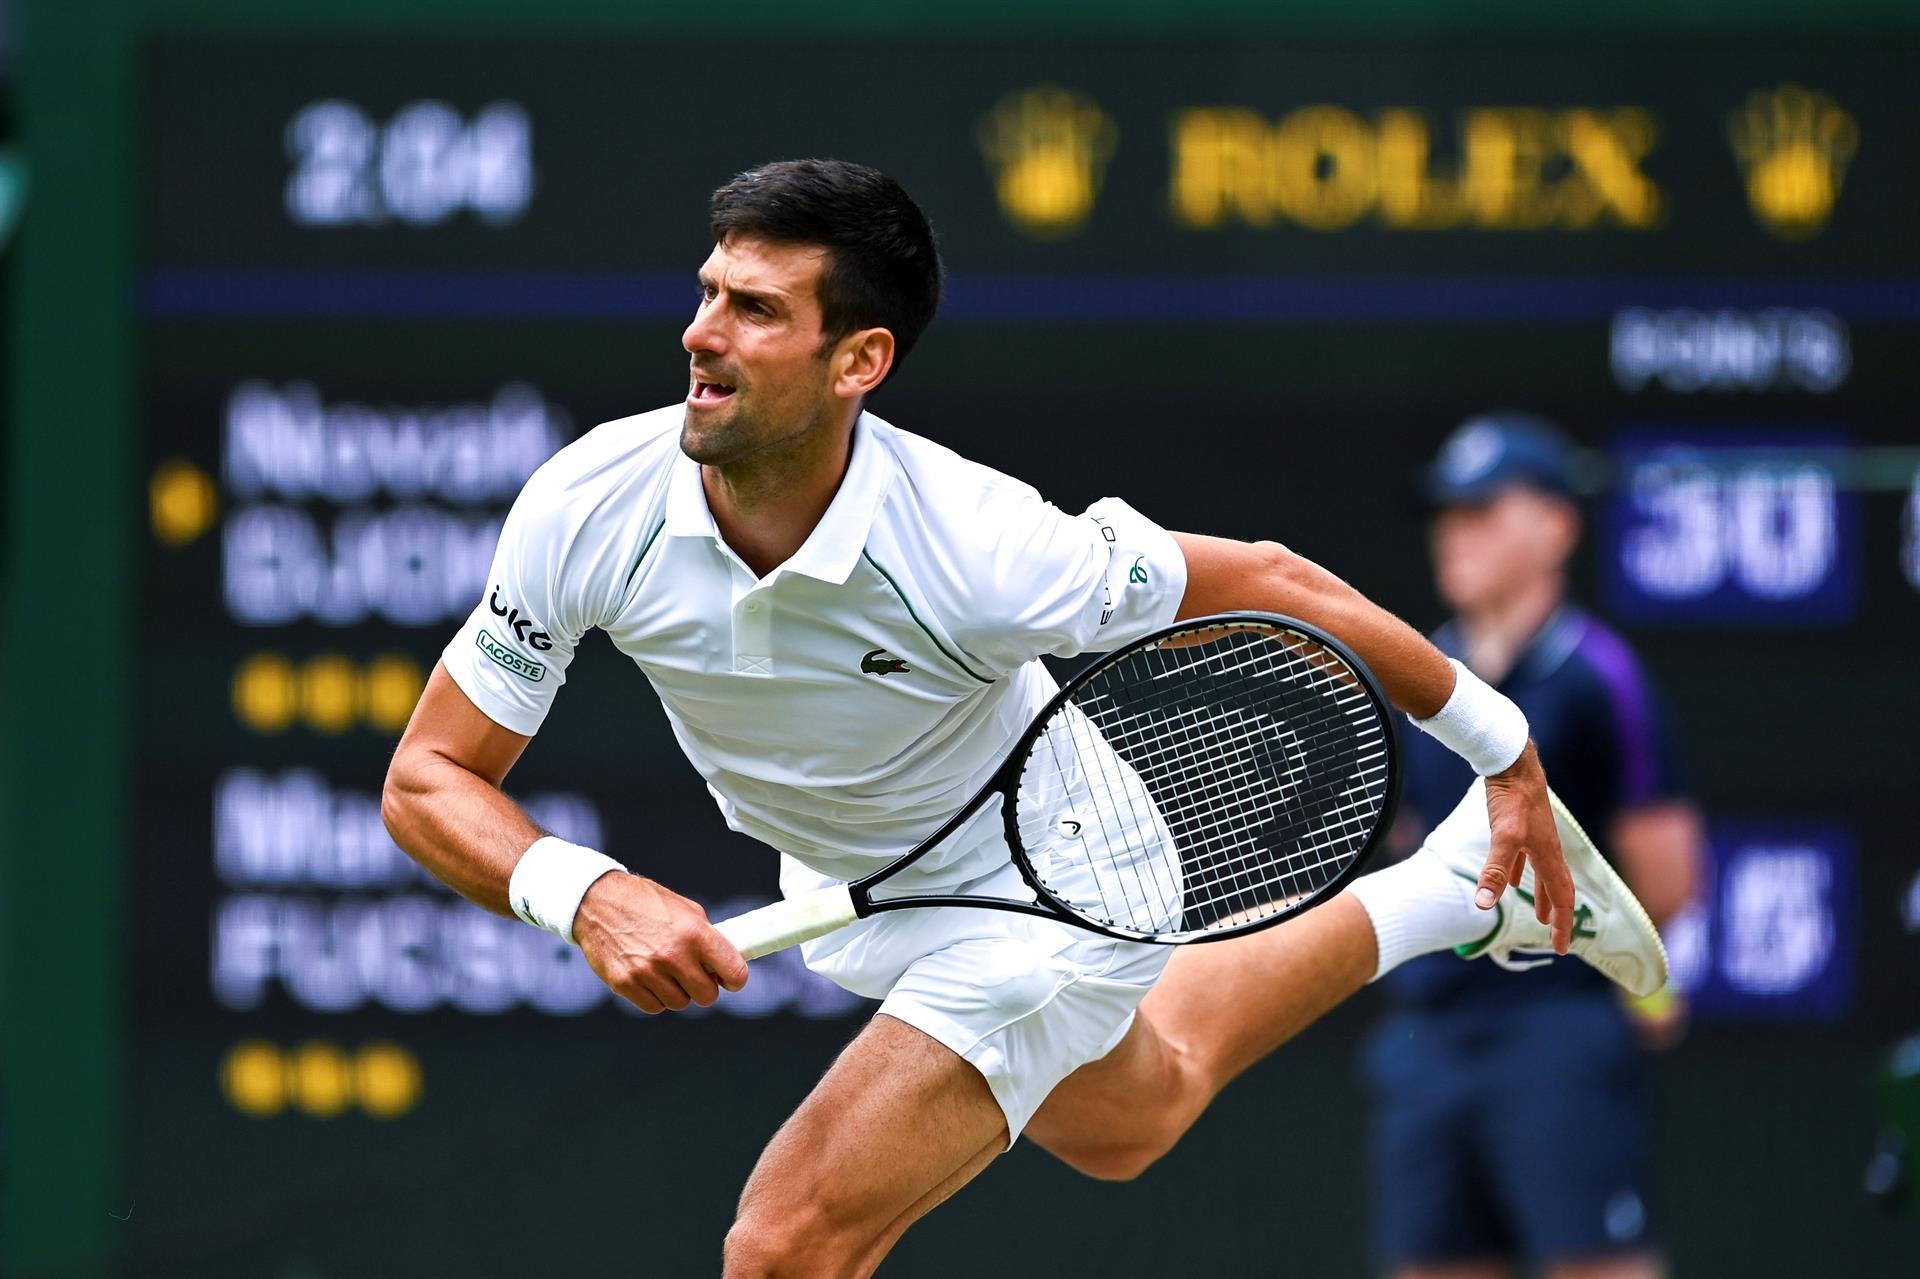 El deportista Novak Djokovic